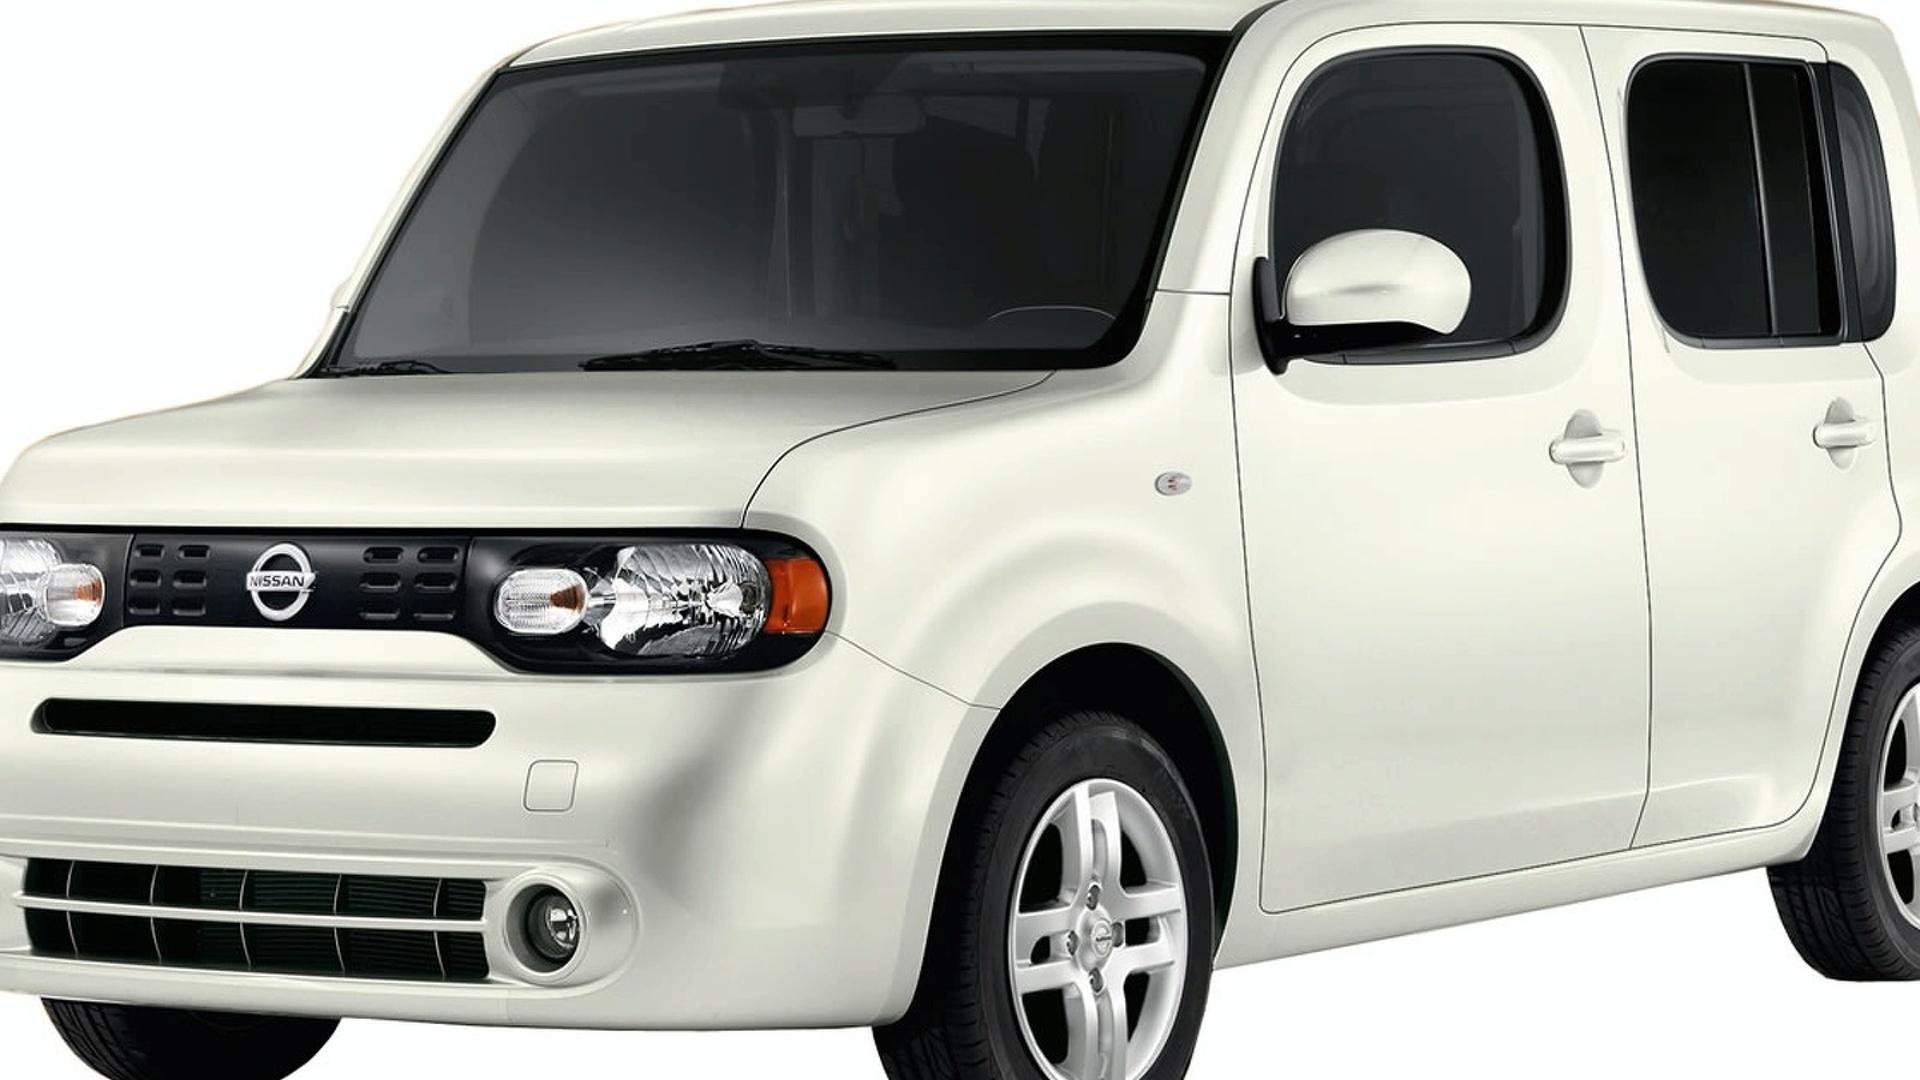 Nissan Cube flops in Europe